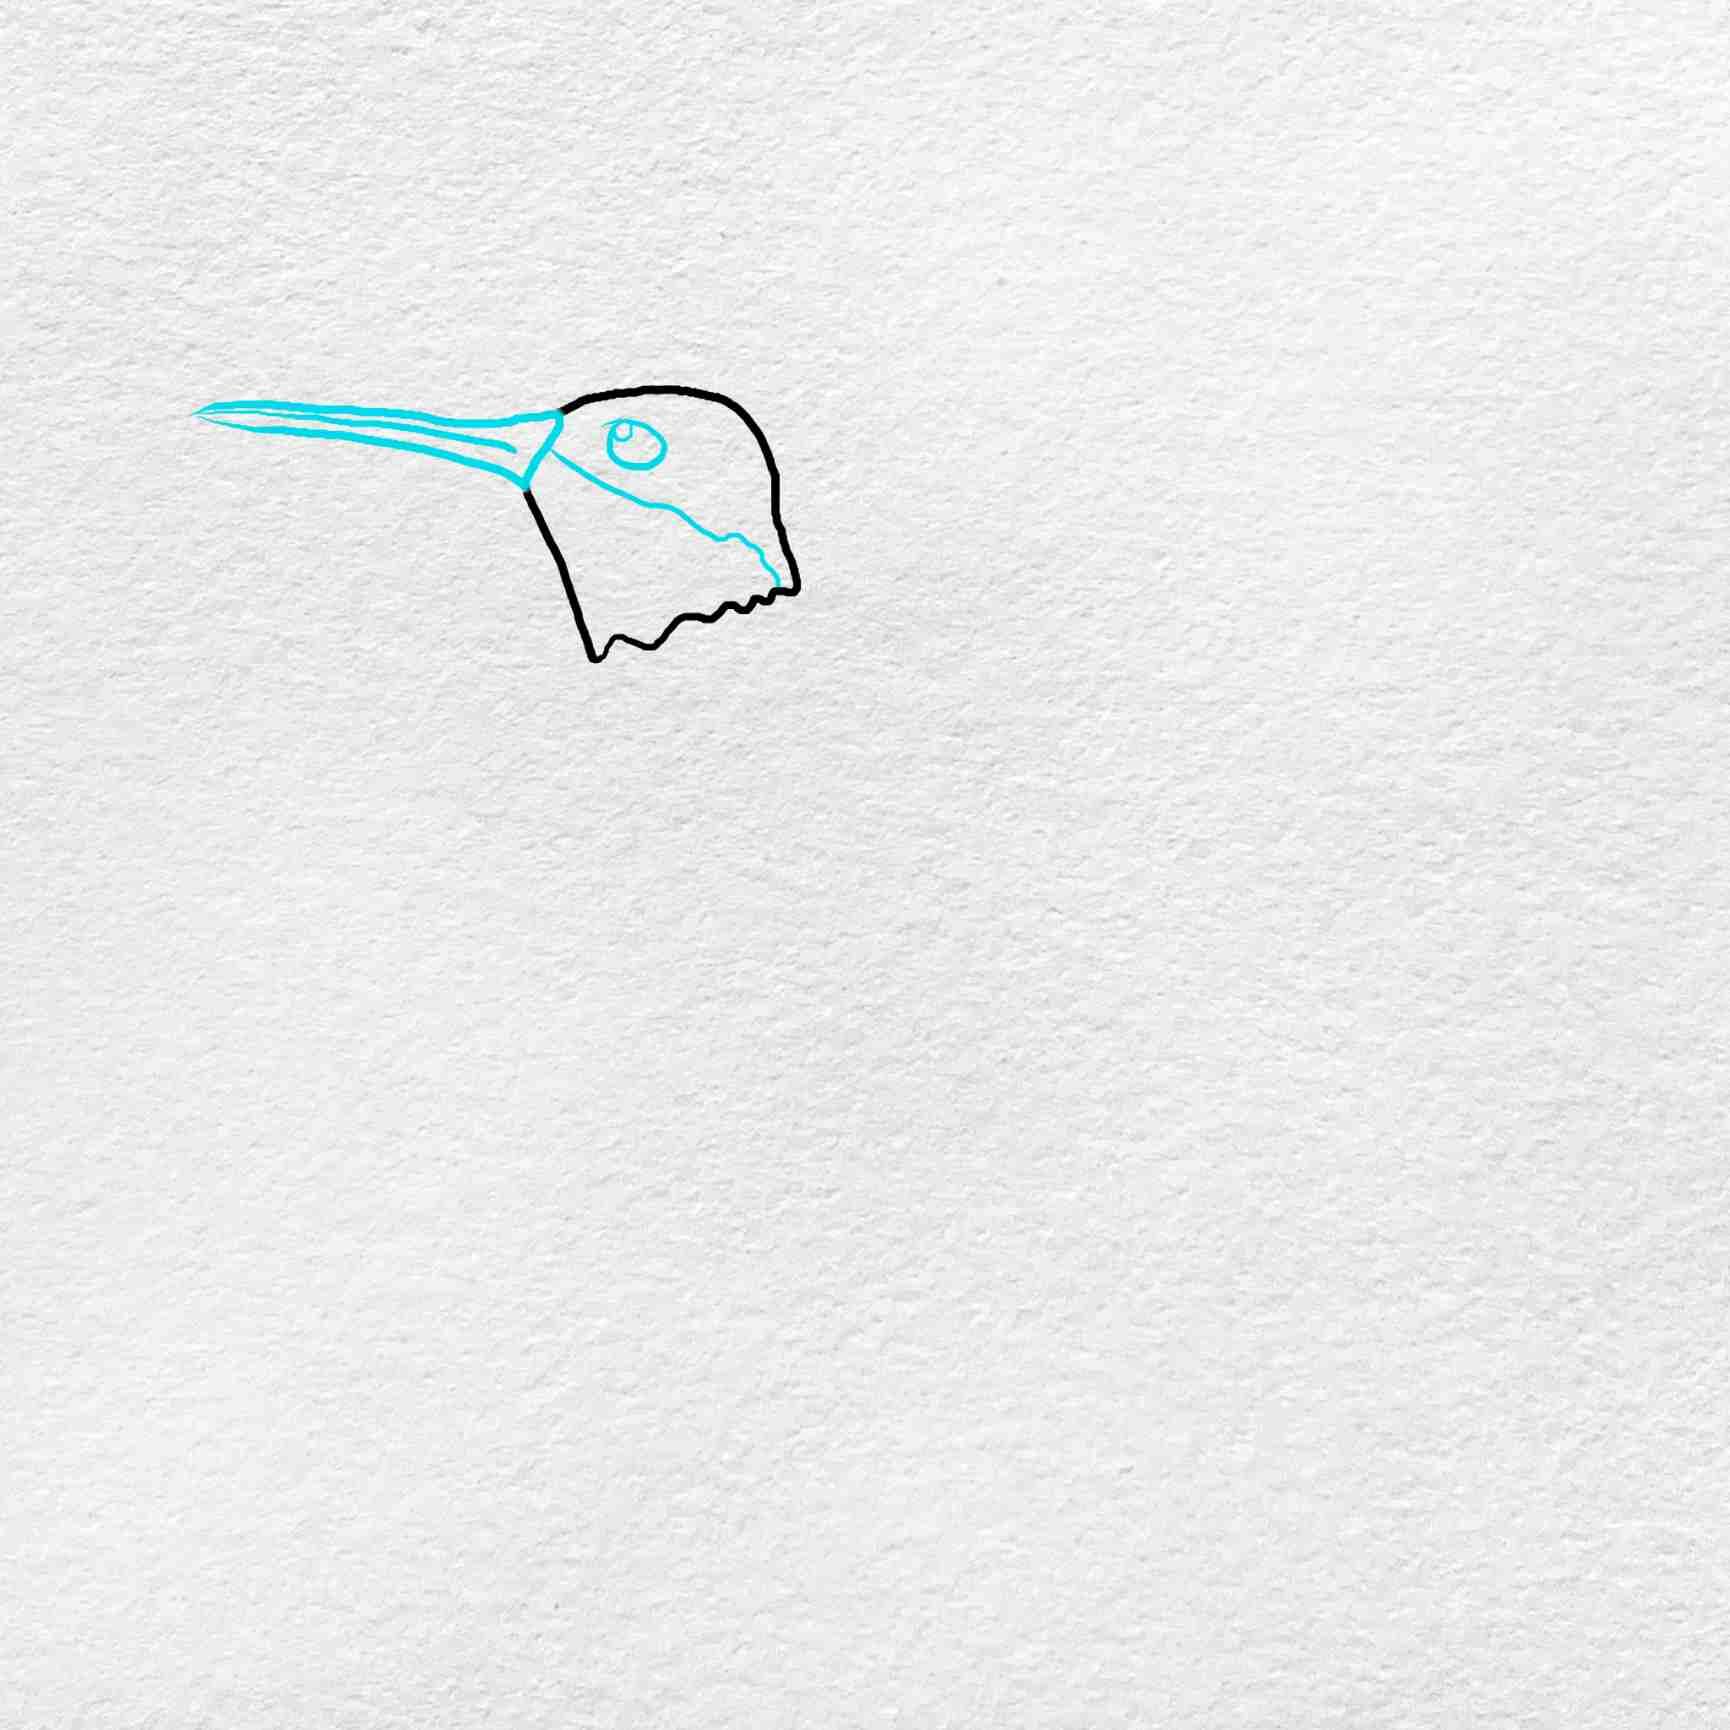 How To Draw Hummingbird: Step 2